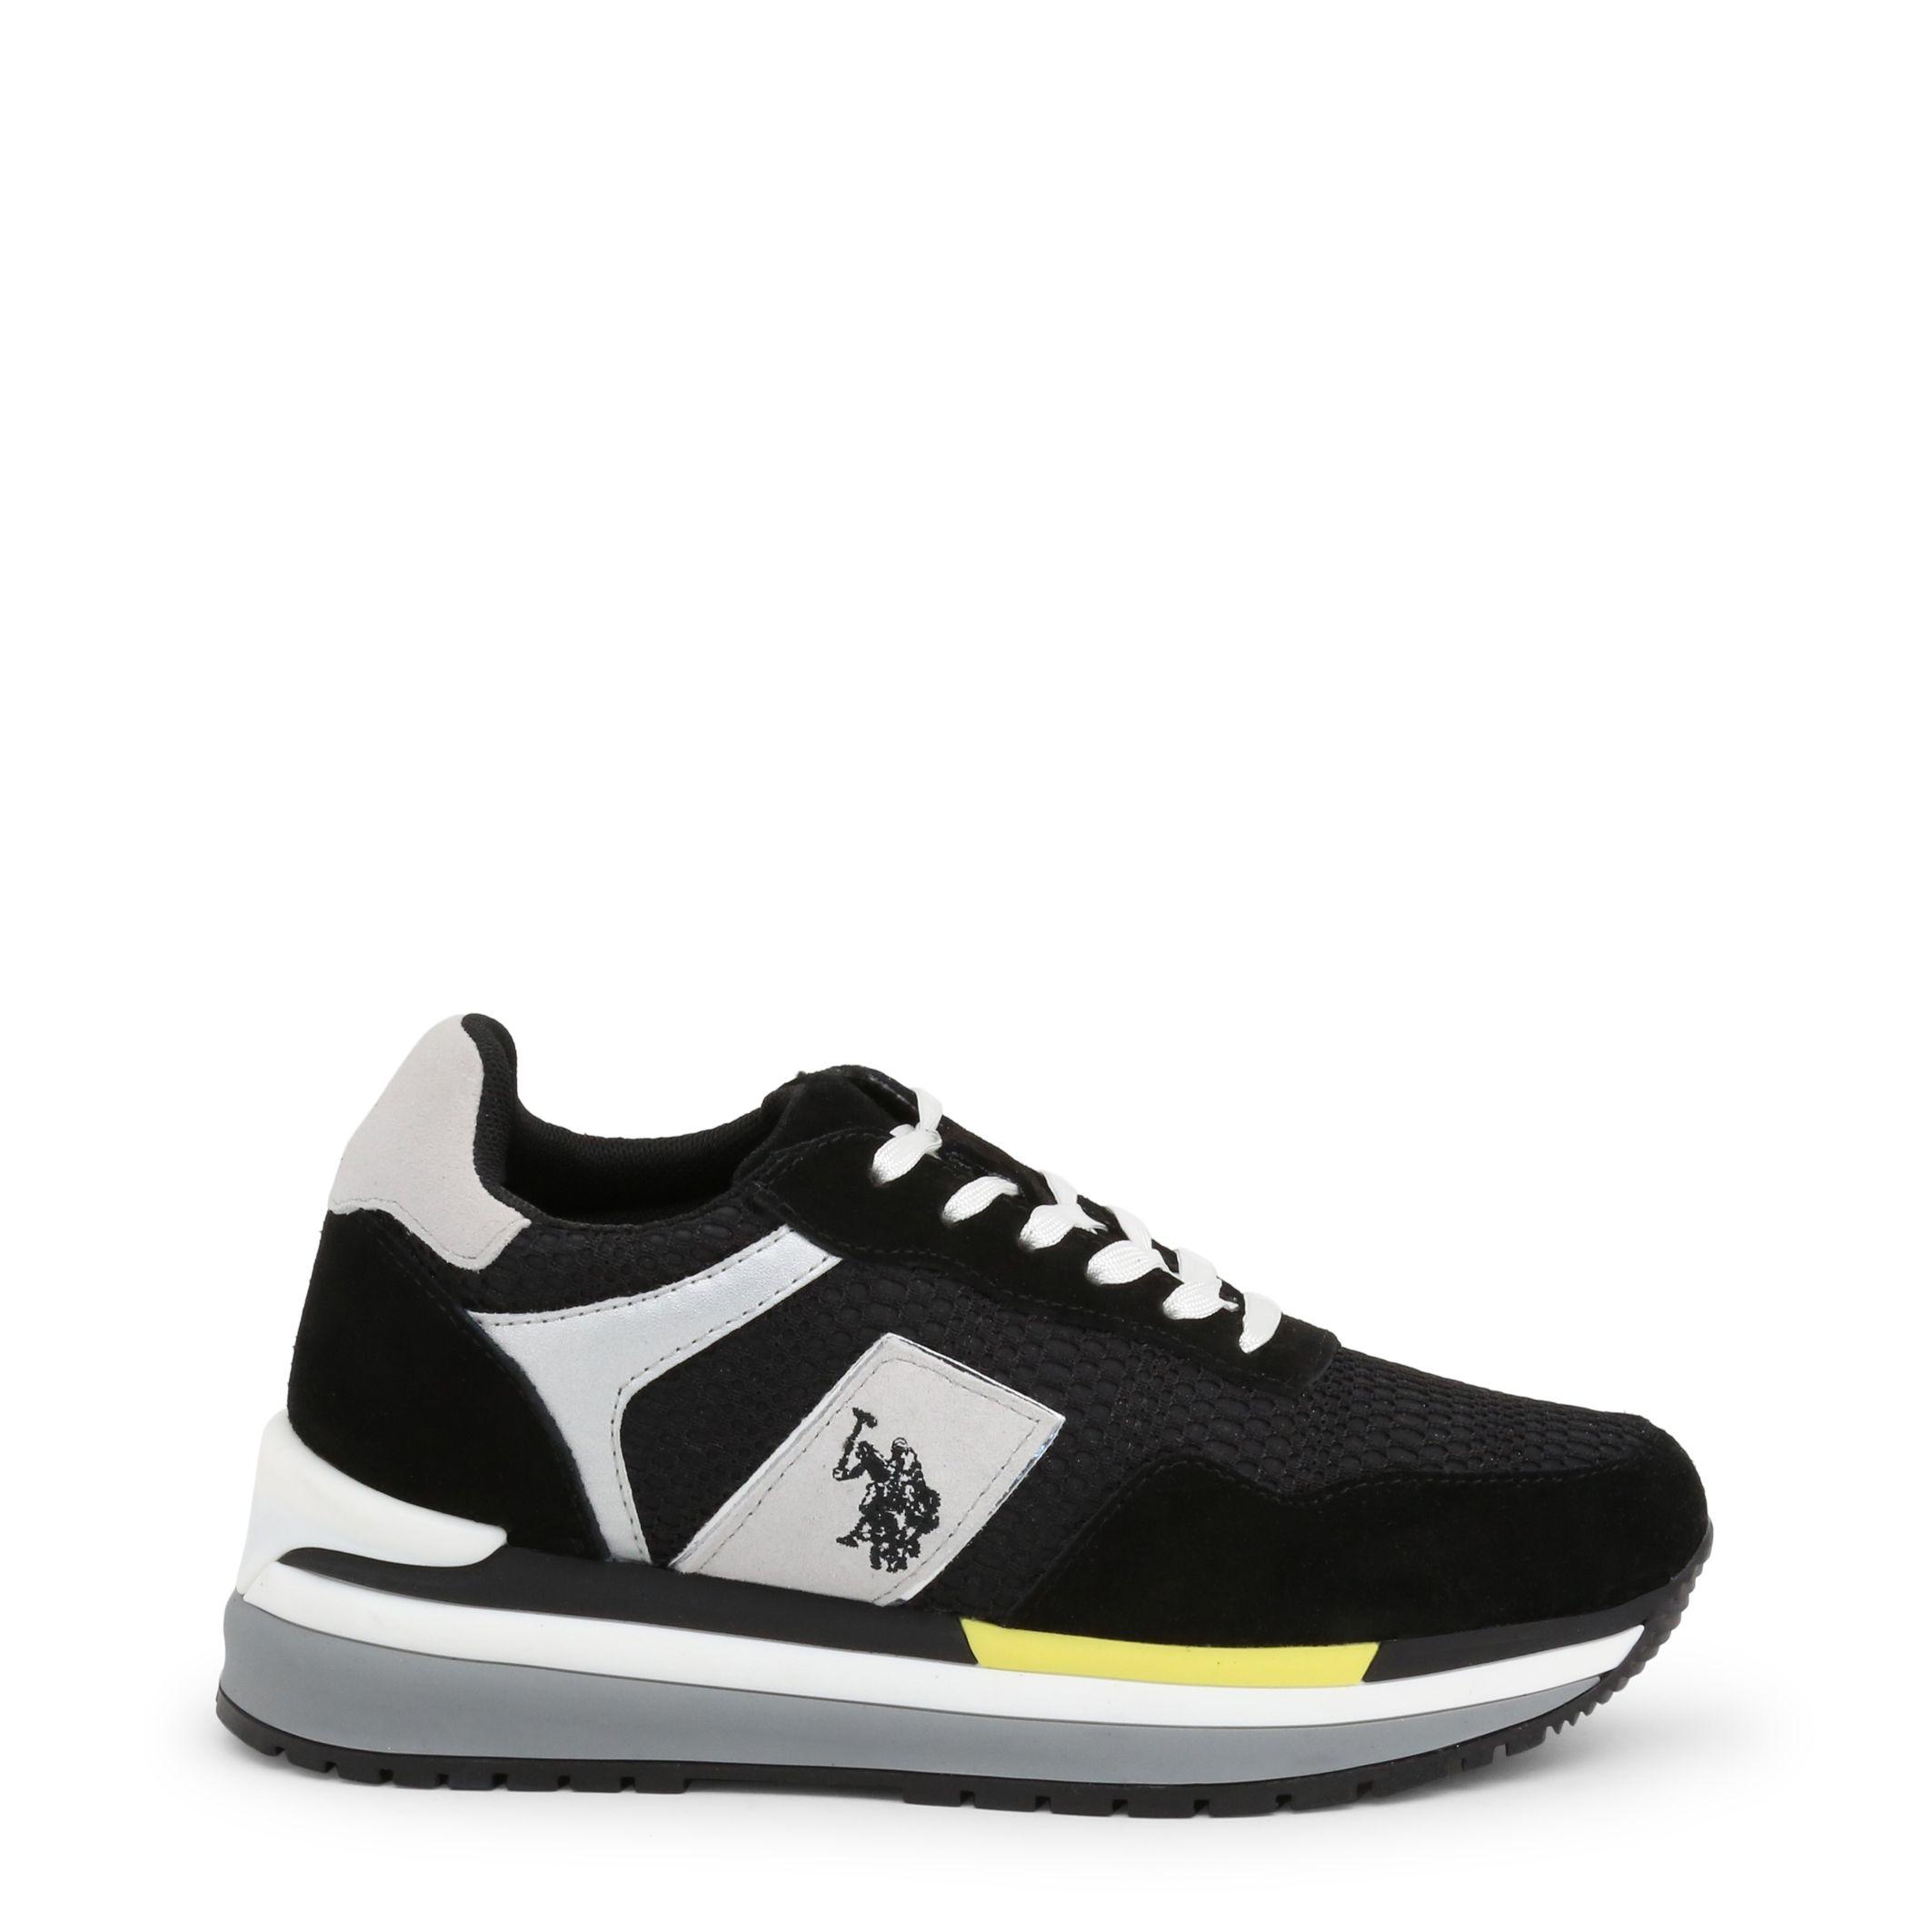 U.S. Polo Assn. – CHER4195S0 Sneakers Dam